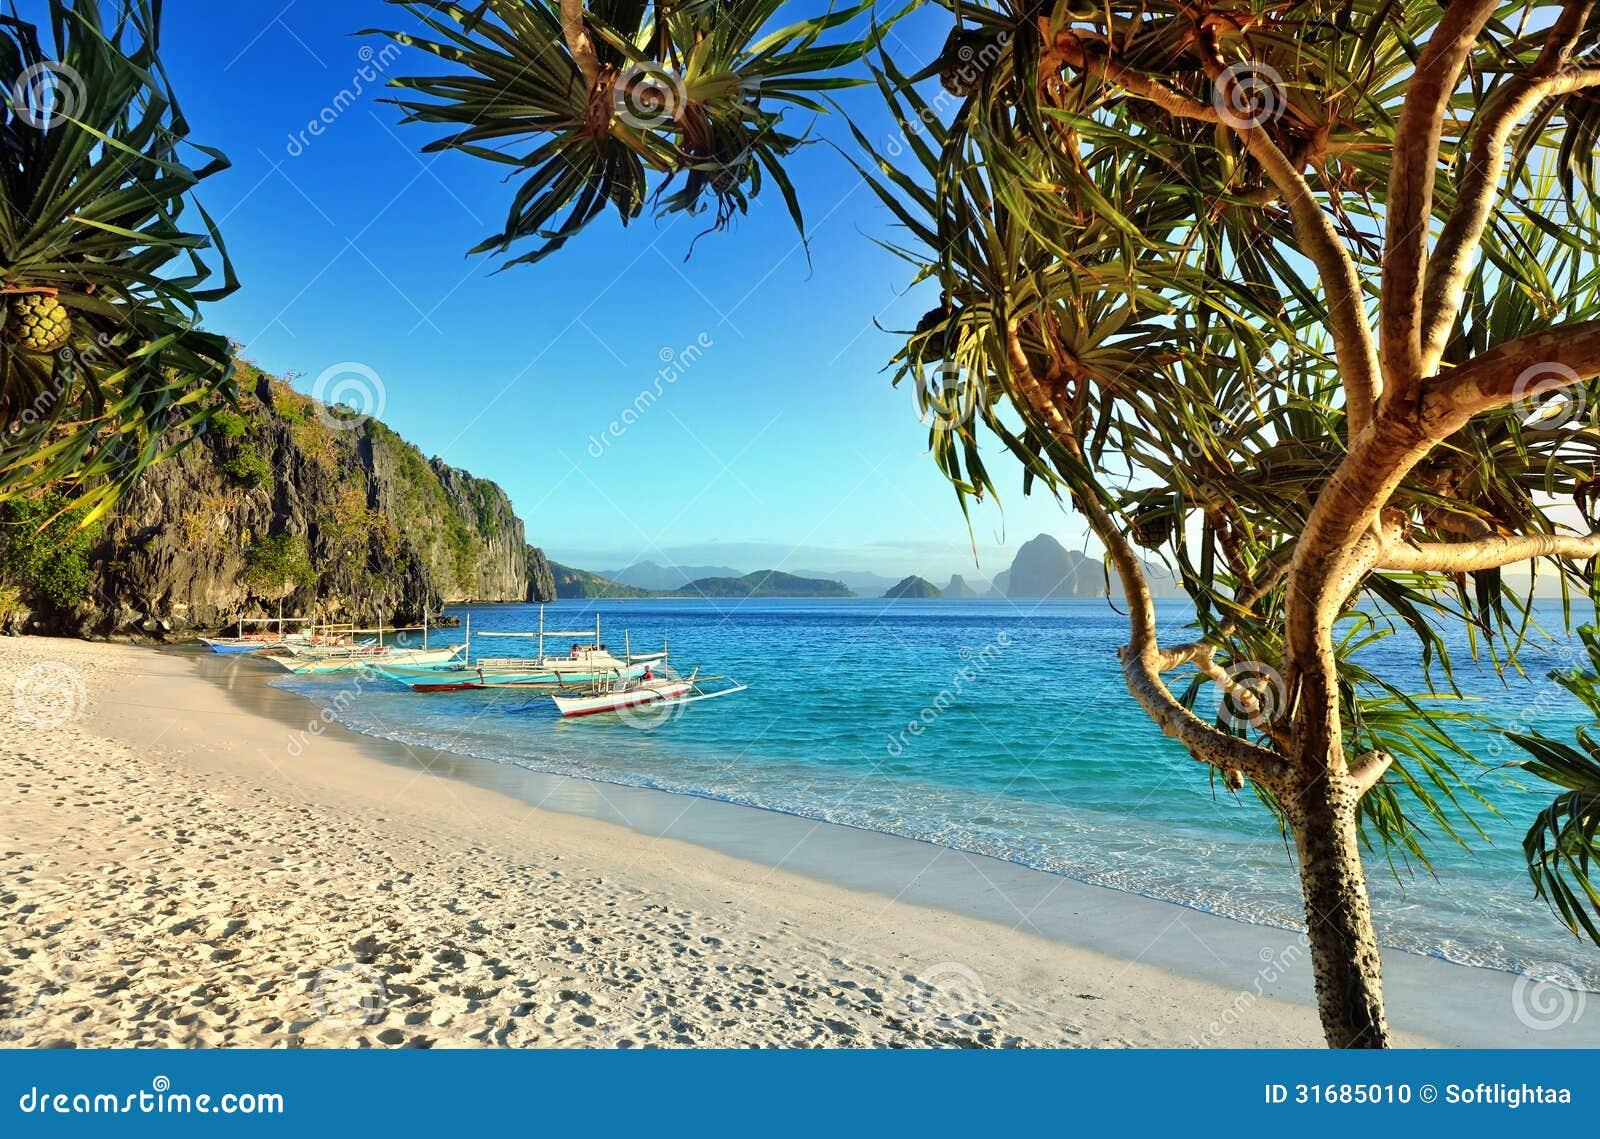 Georgia Beaches And Islands